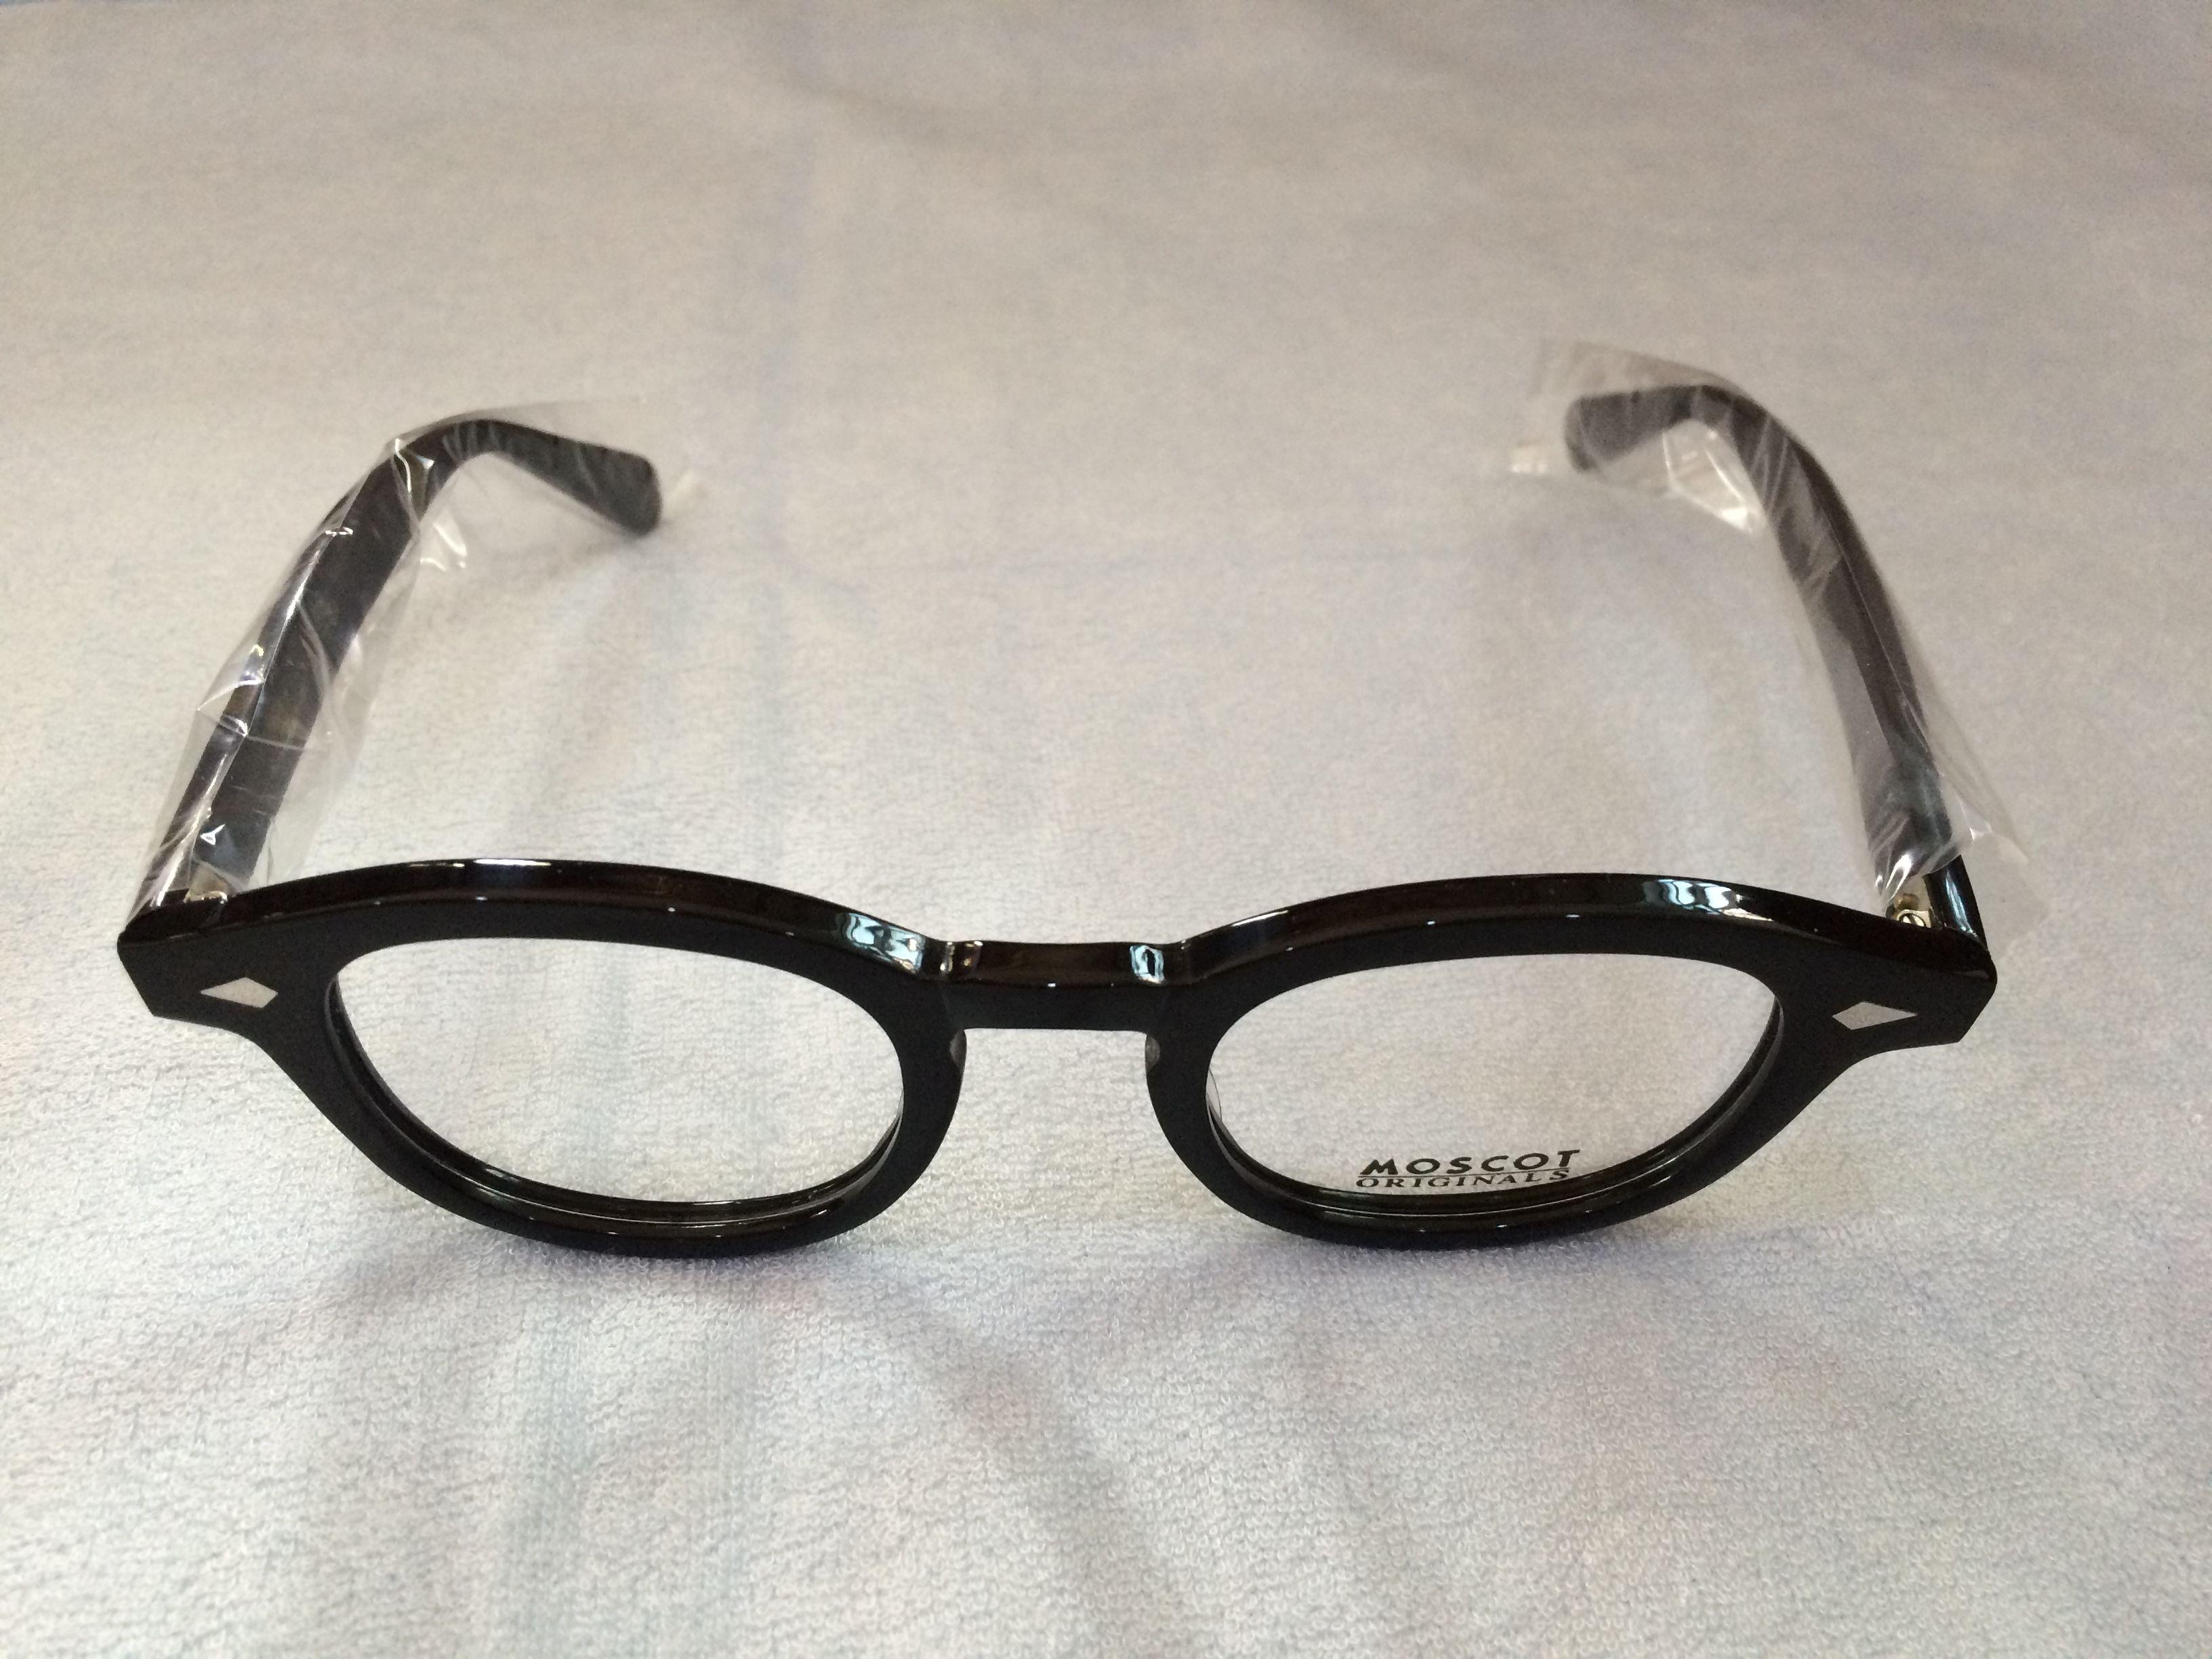 2c97137c251 Retro Vintage Johnny Depp Glasses Men Women Uomo Top Quality Brand ...